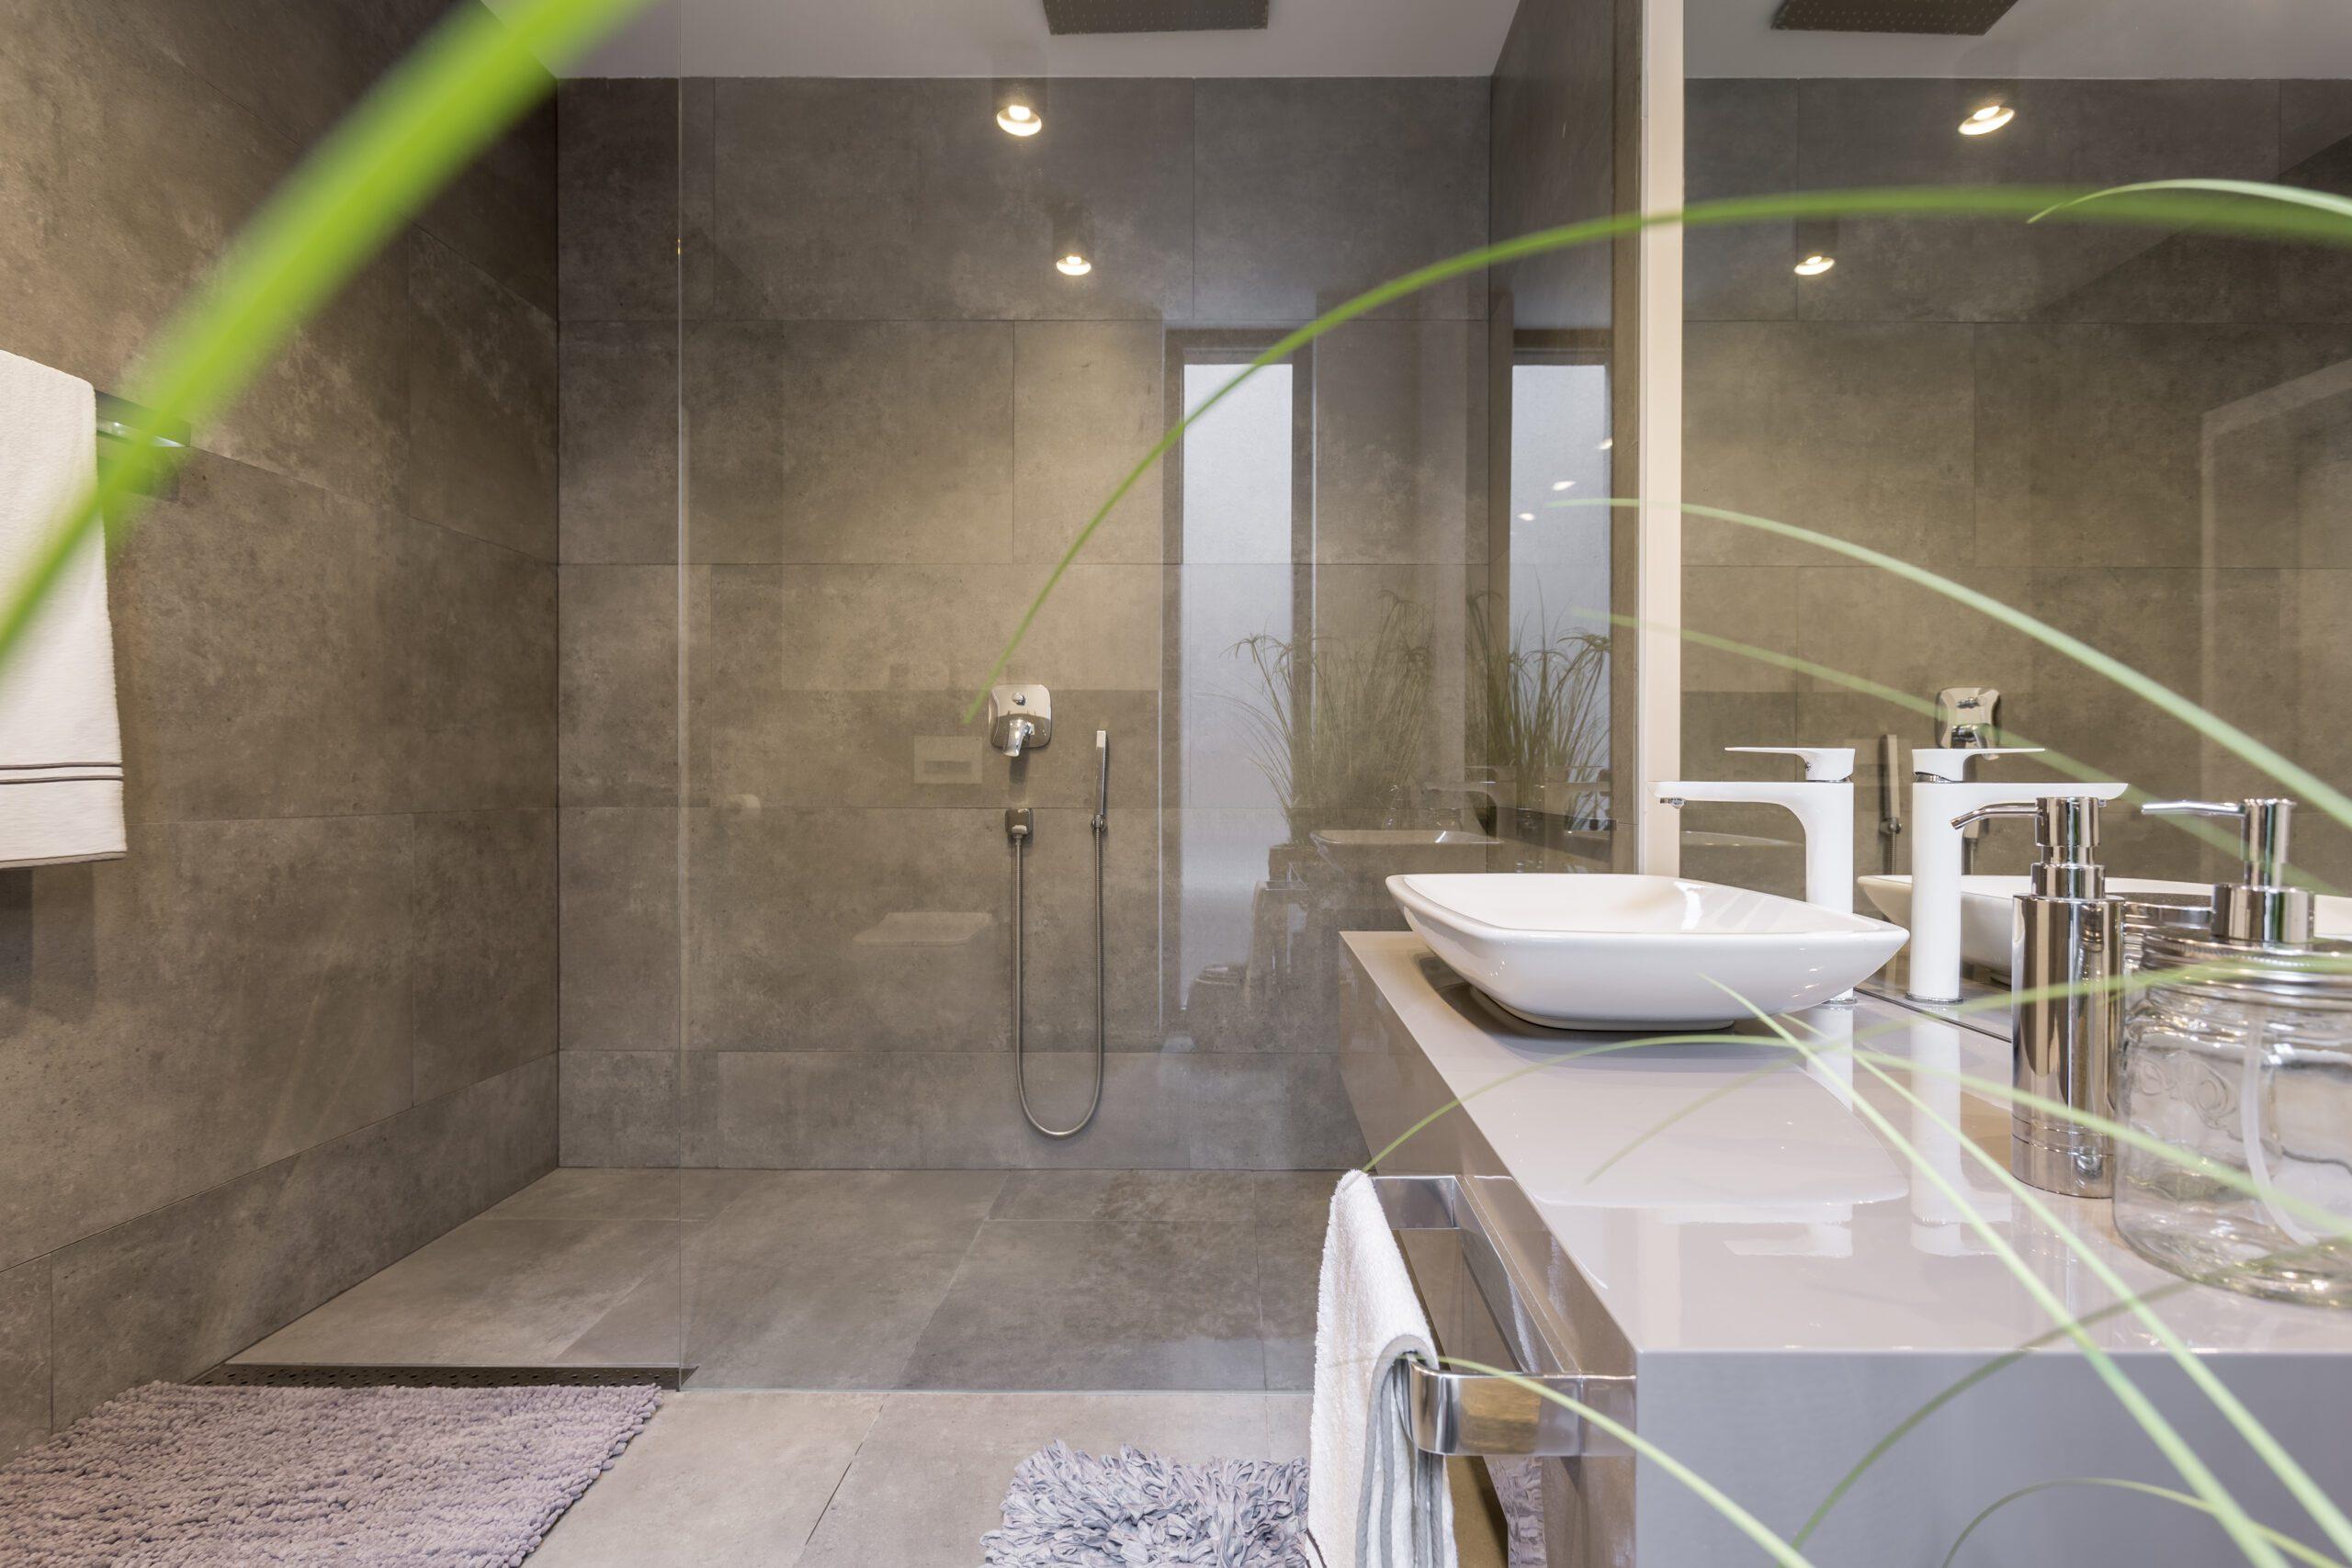 The Showdown Walk-in Tub Vs. Walk-in Shower